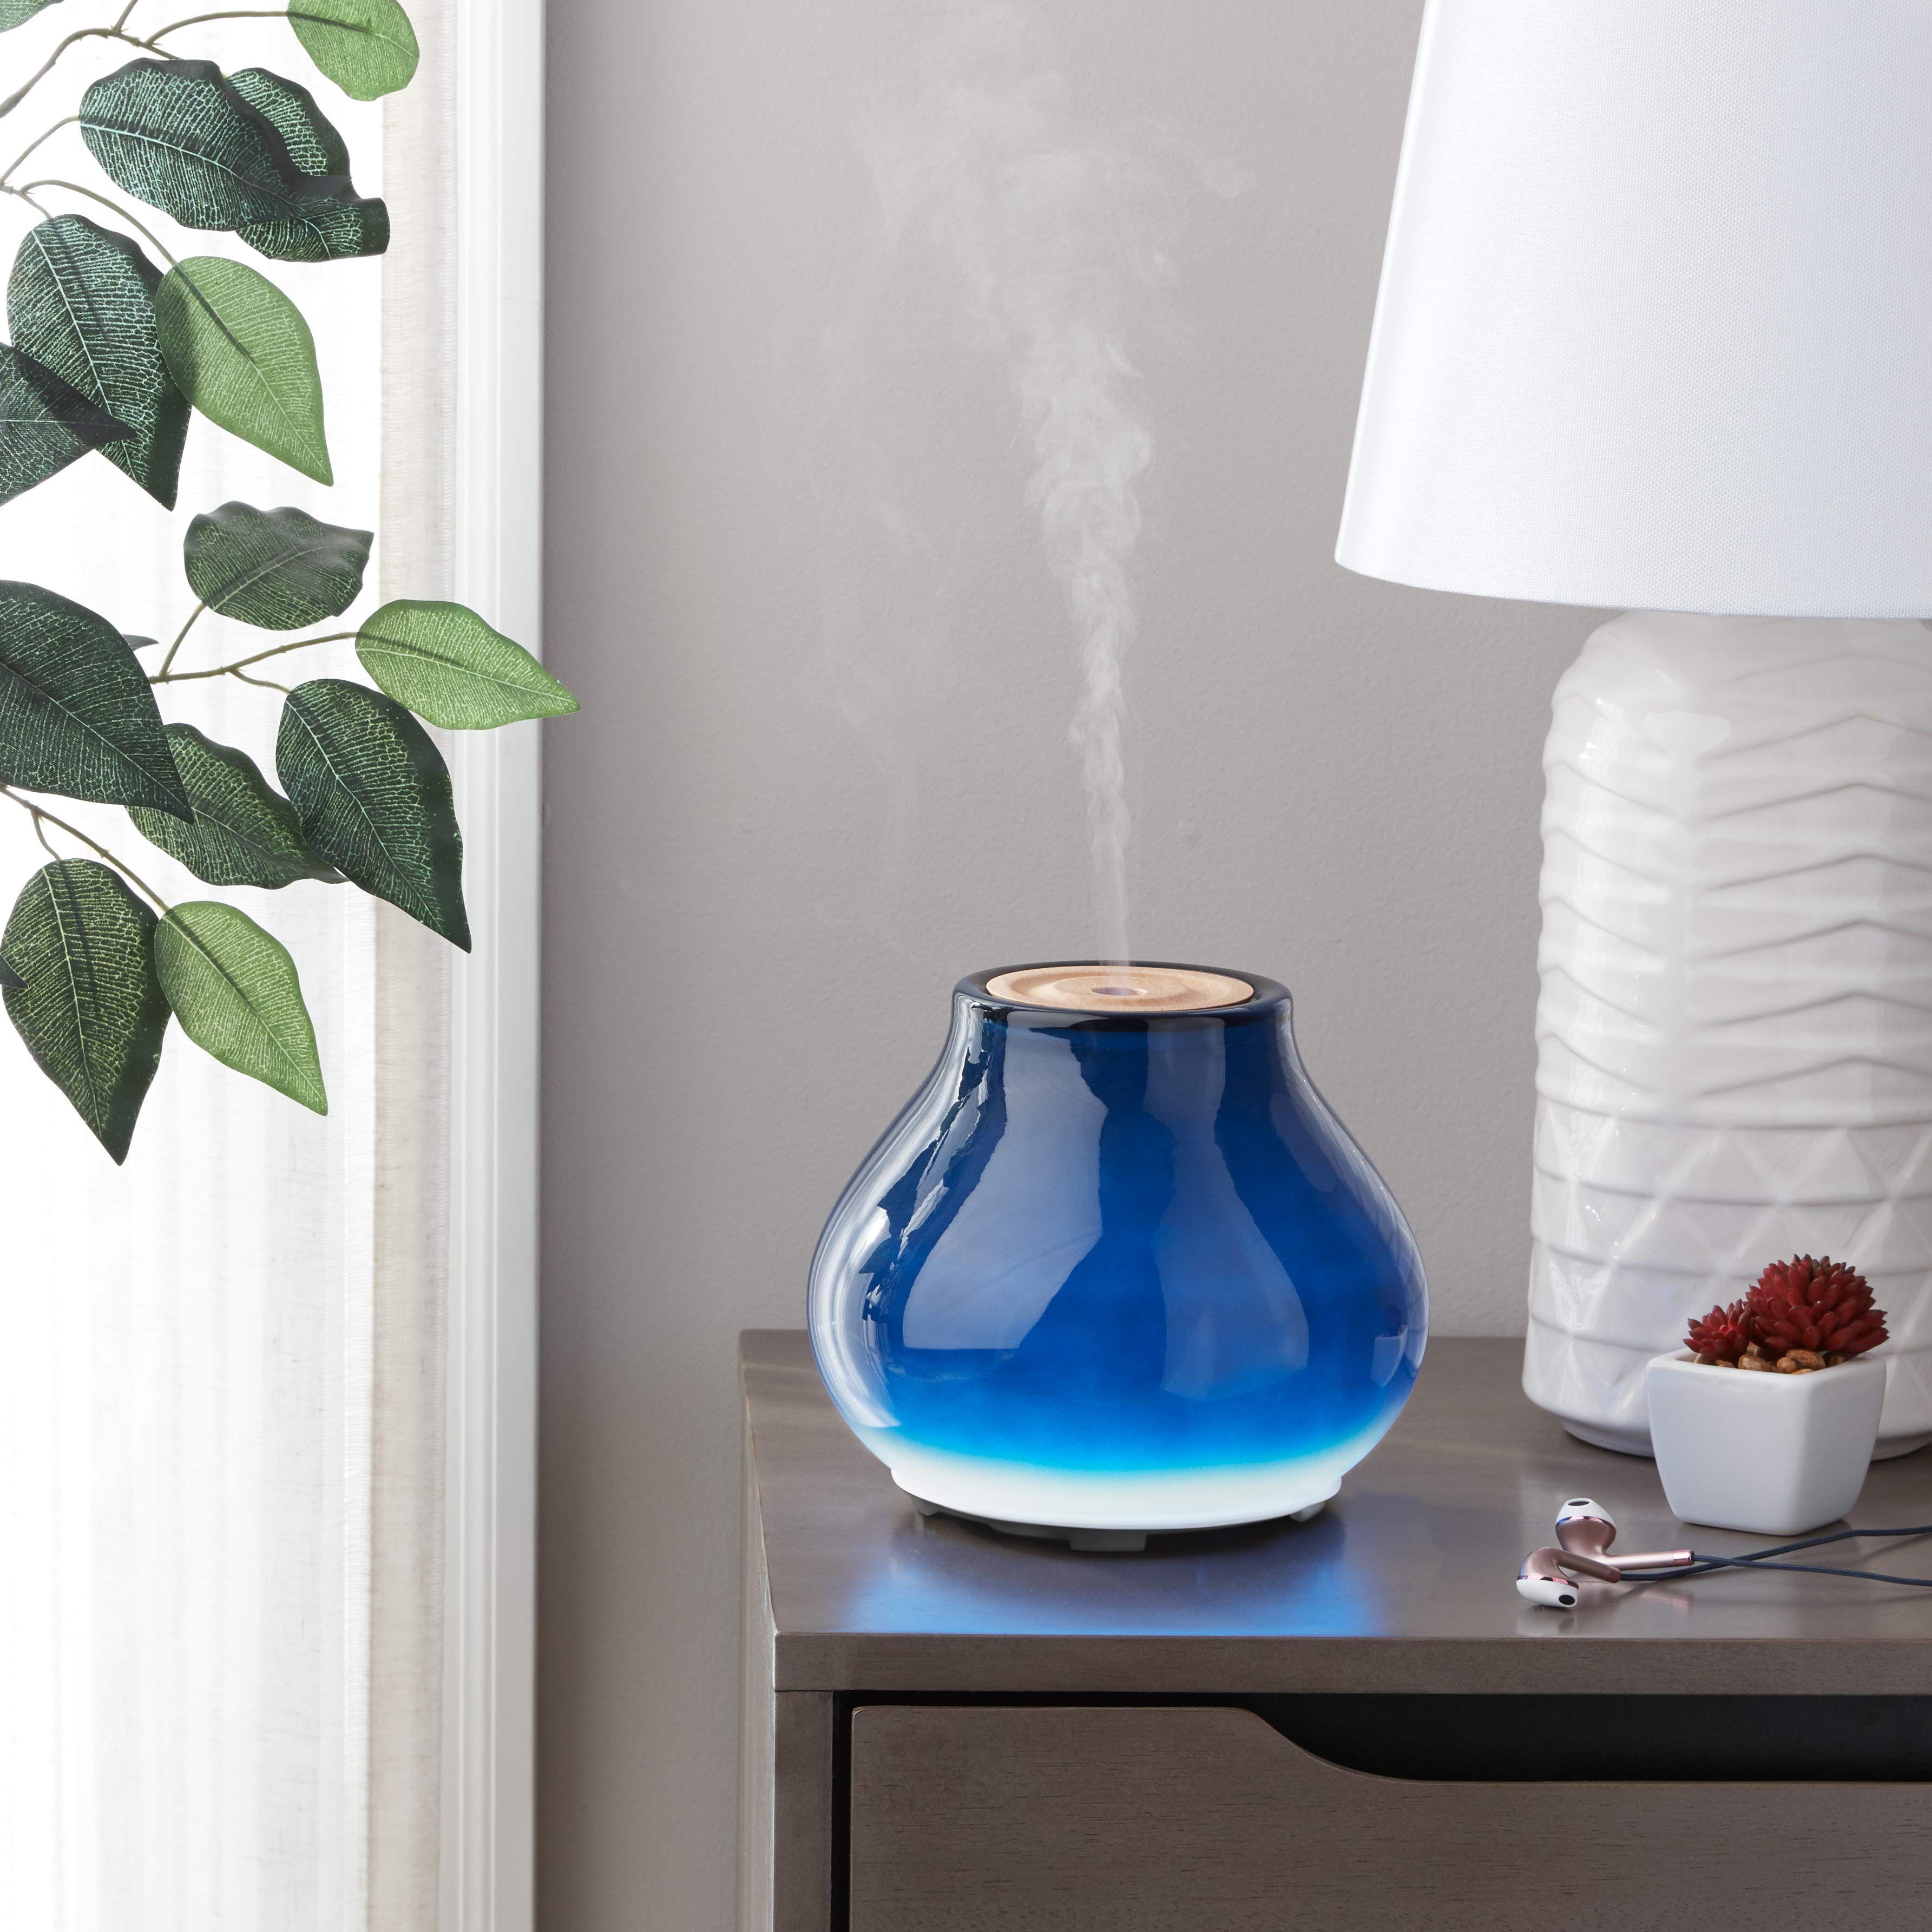 Imagine Cordless Ultrasonic Aroma Diffuser Aroma Diffuser Ultrasonic Aroma Diffuser Mist Diffuser